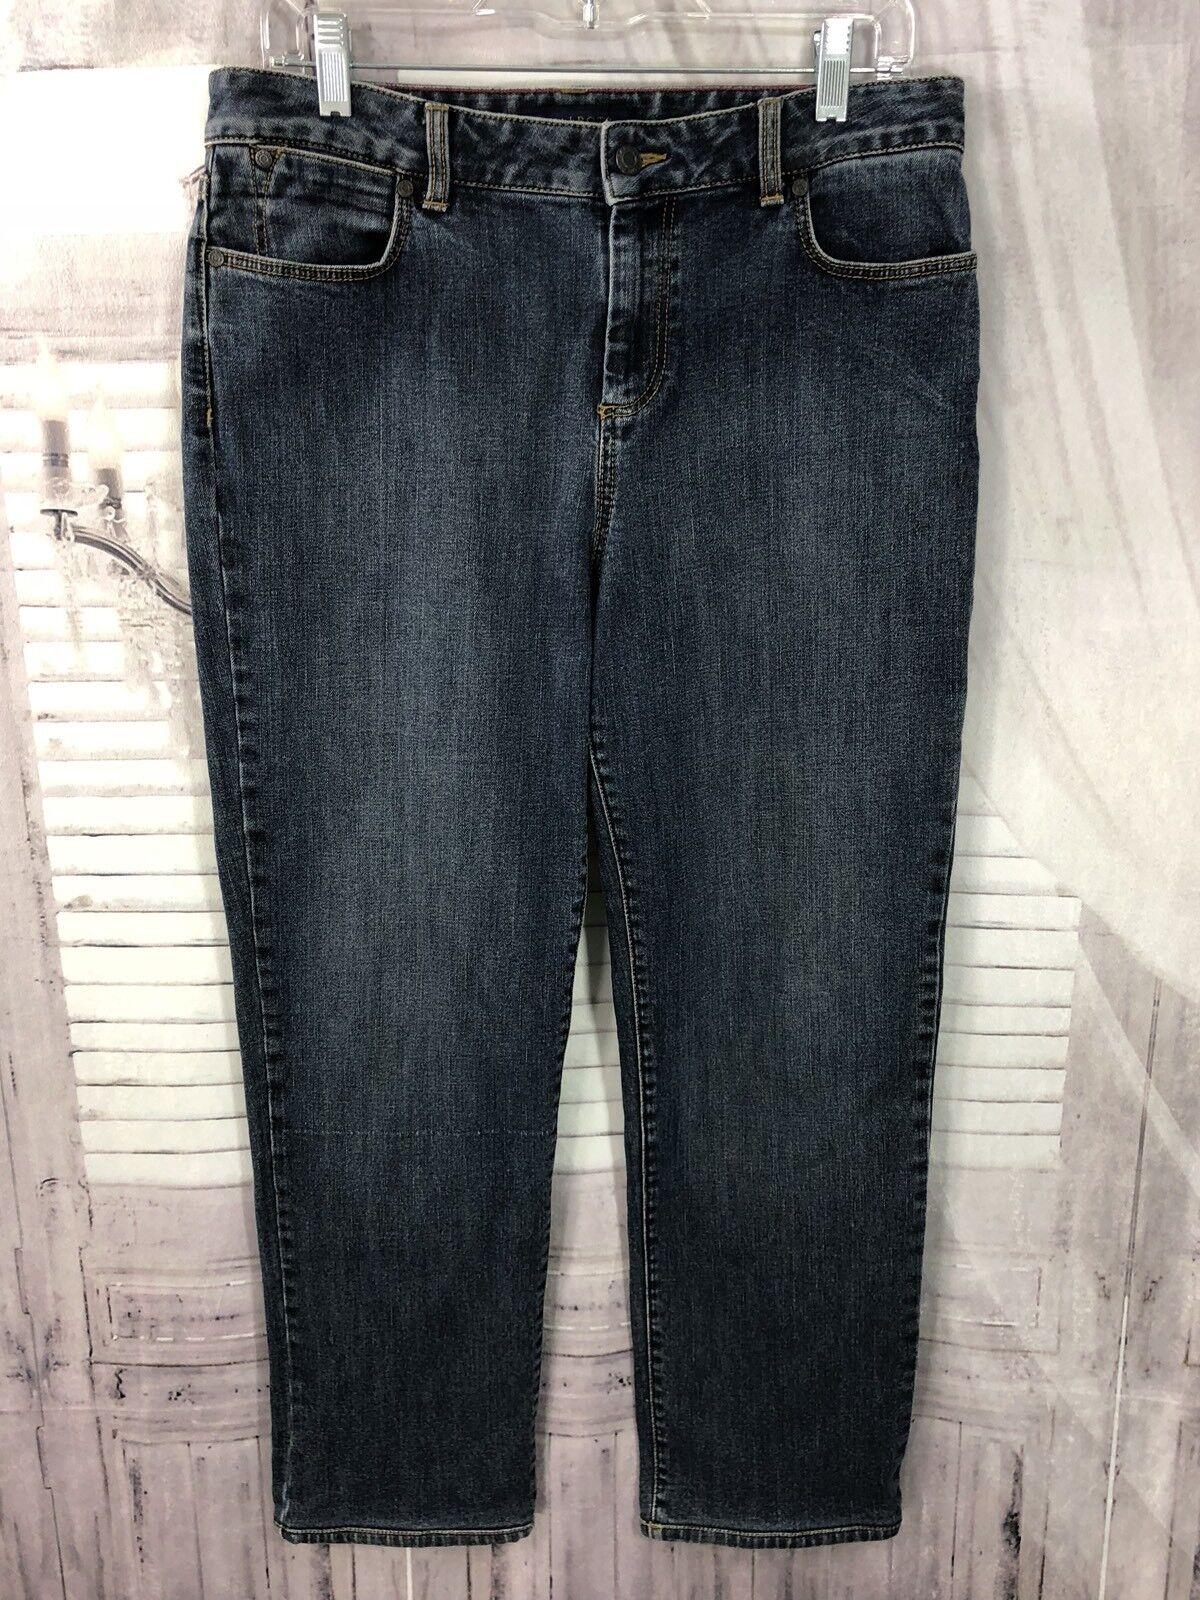 Talbots Womens Heritage Straight Leg Jeans Stretch bluee Sz 12P Petite Large